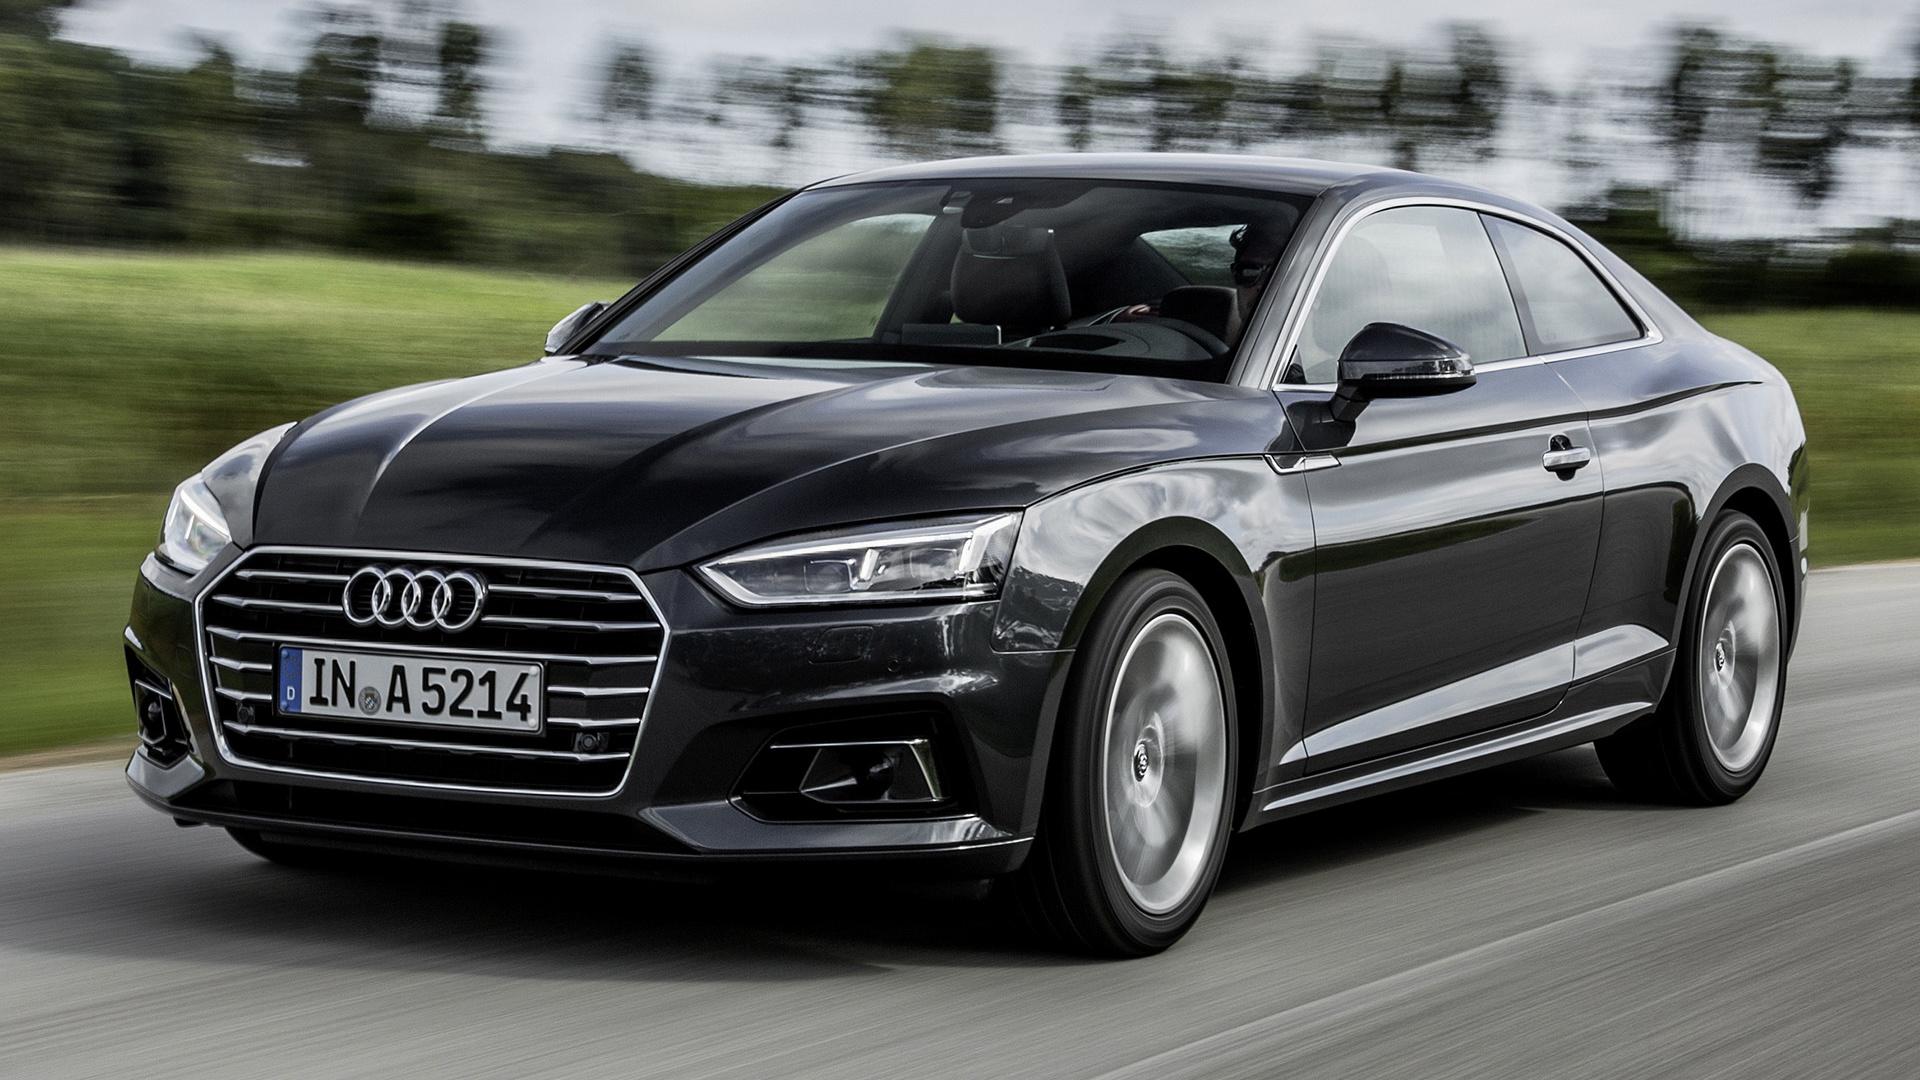 Finde heraus ob audi a5 2015 im preis steigen oder fallen. 2016 Audi A5 Coupe - Wallpapers and HD Images | Car Pixel